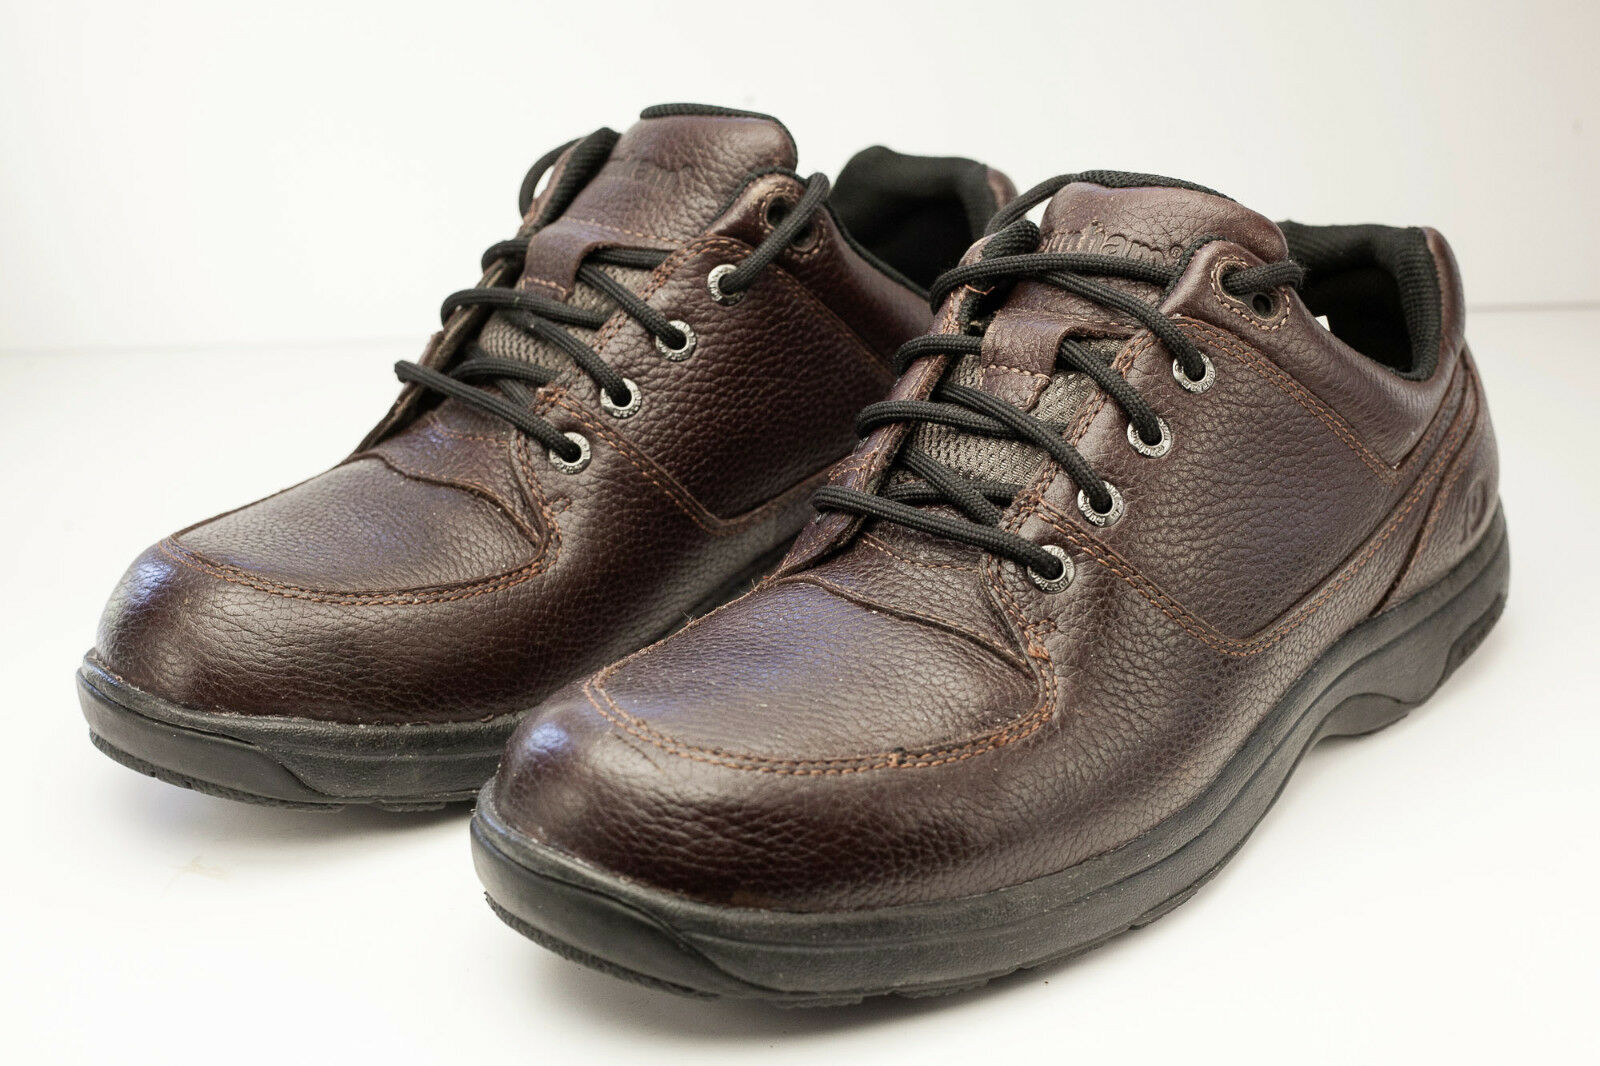 Dunham Windsor 12 Brown Waterproof Oxford Men's shoes